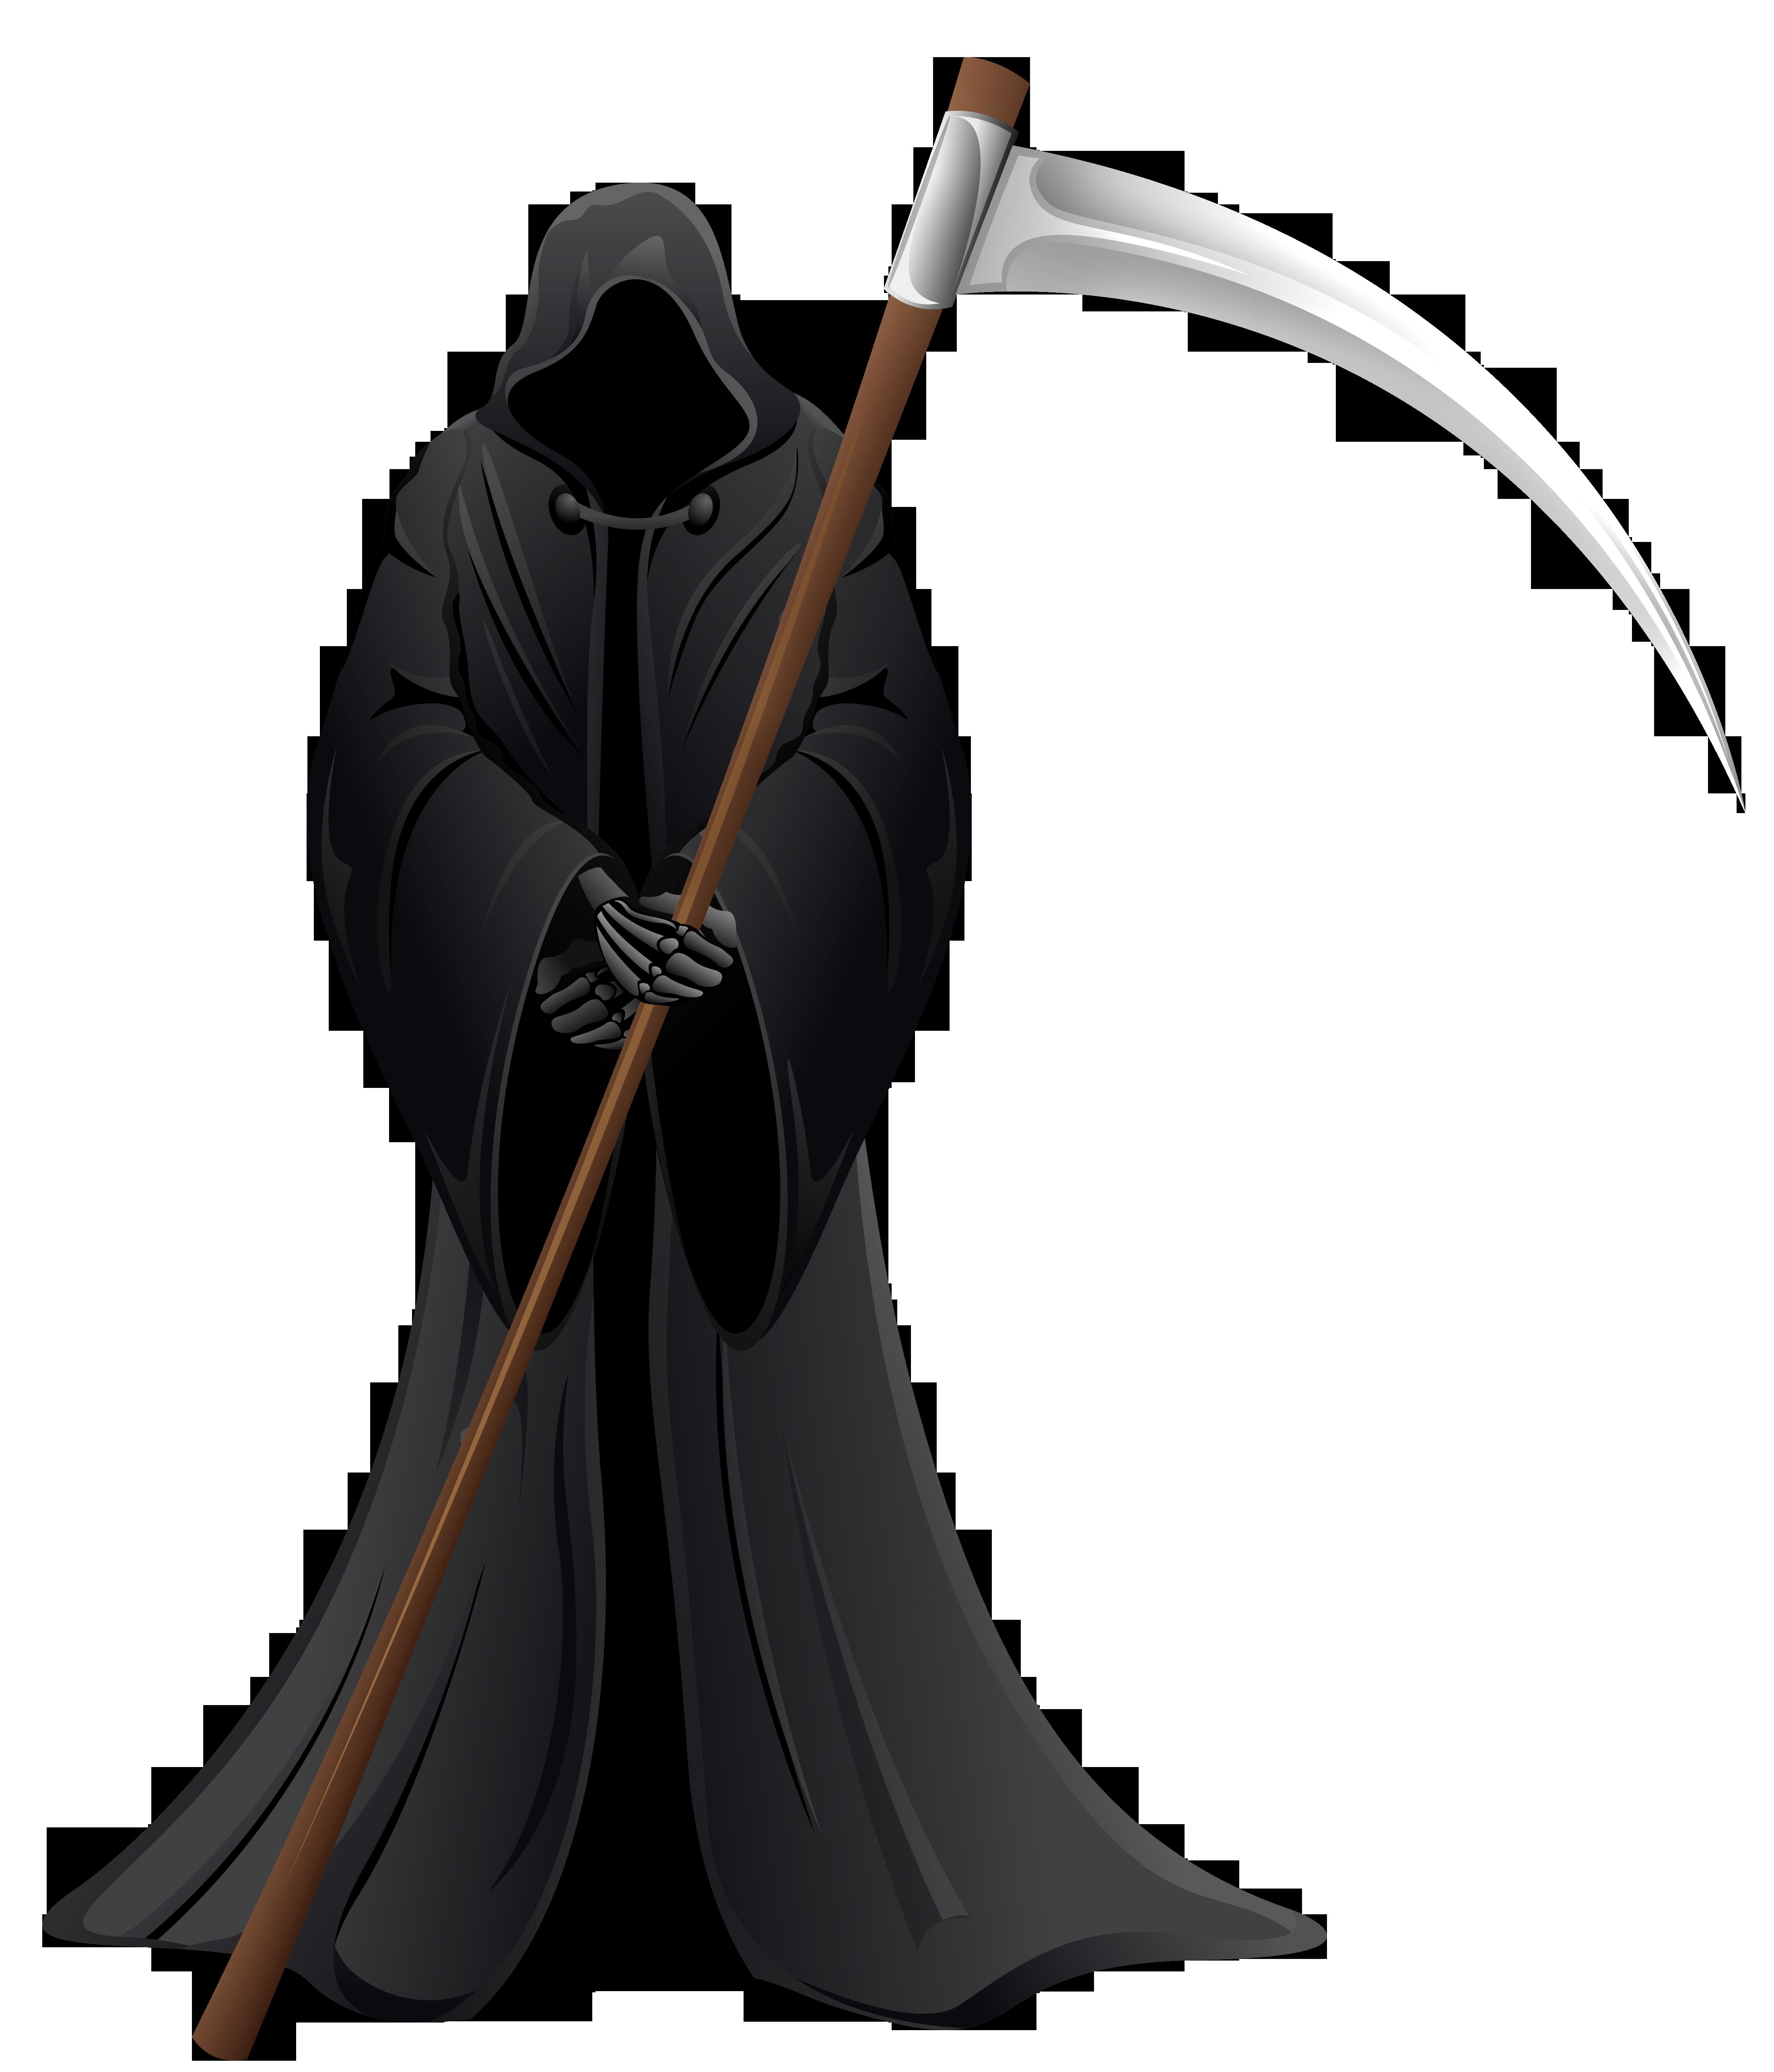 Grim reaper clipart - Clipground